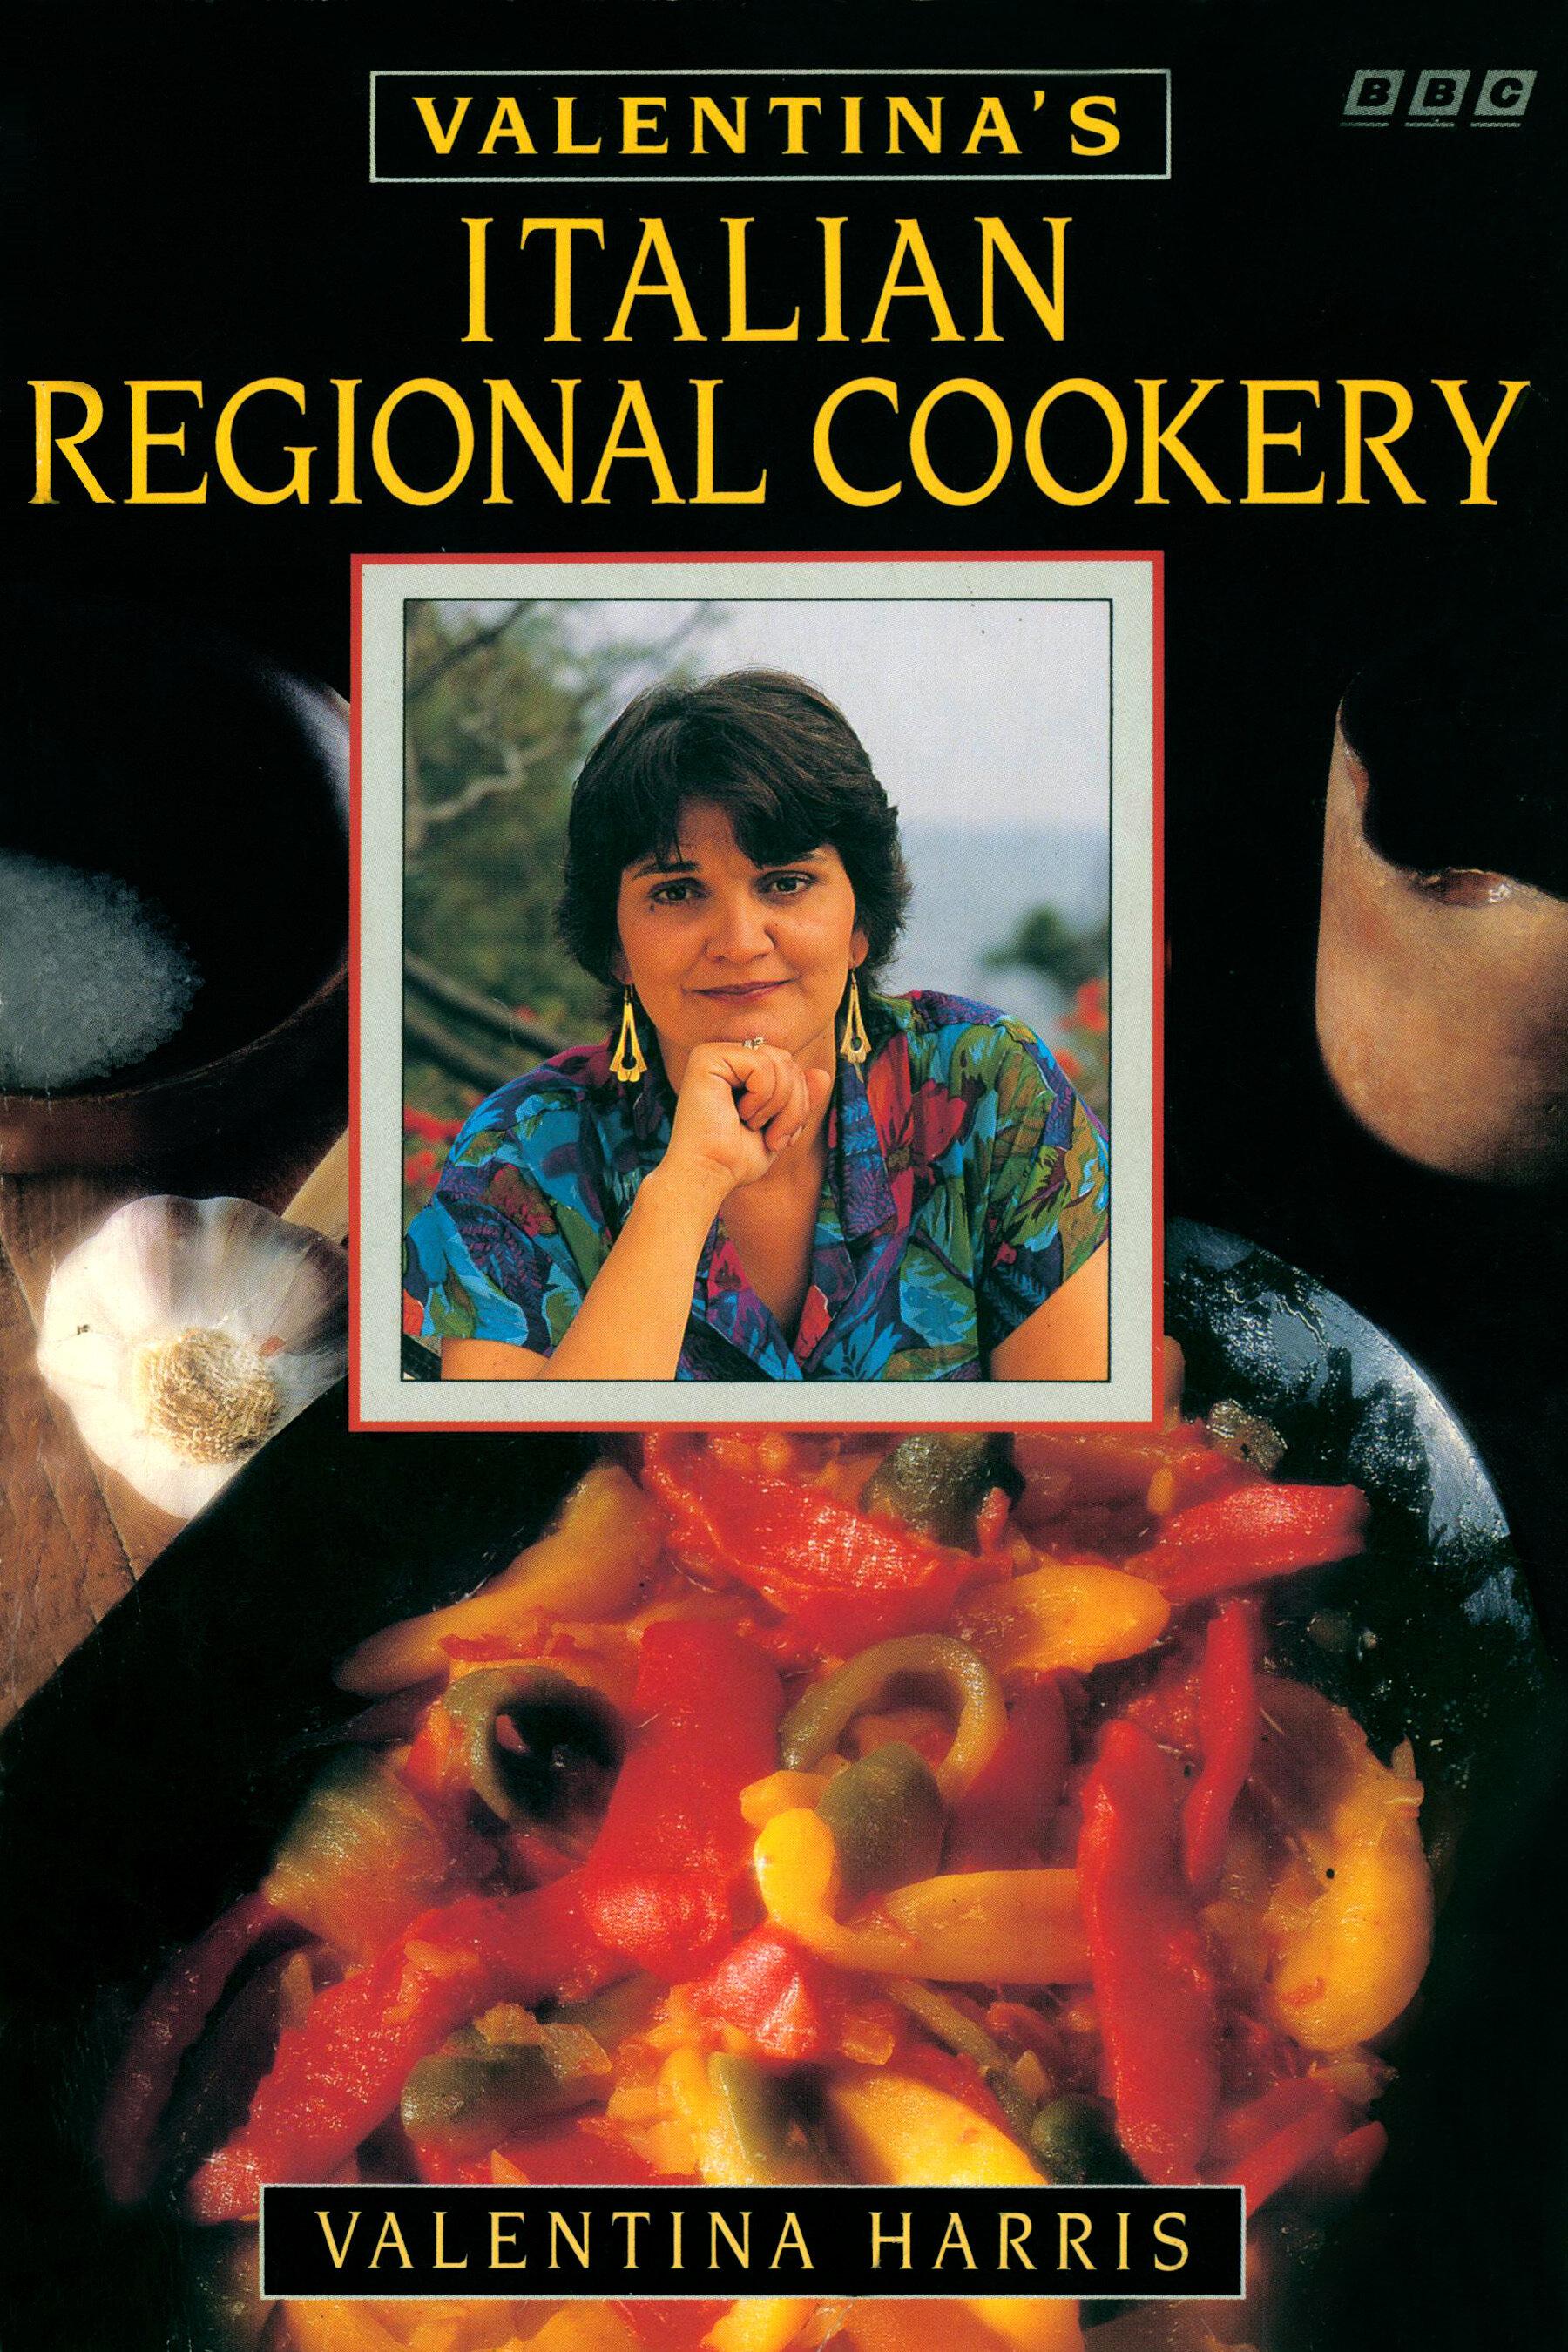 Valentina's Italian Regional Cookery cover